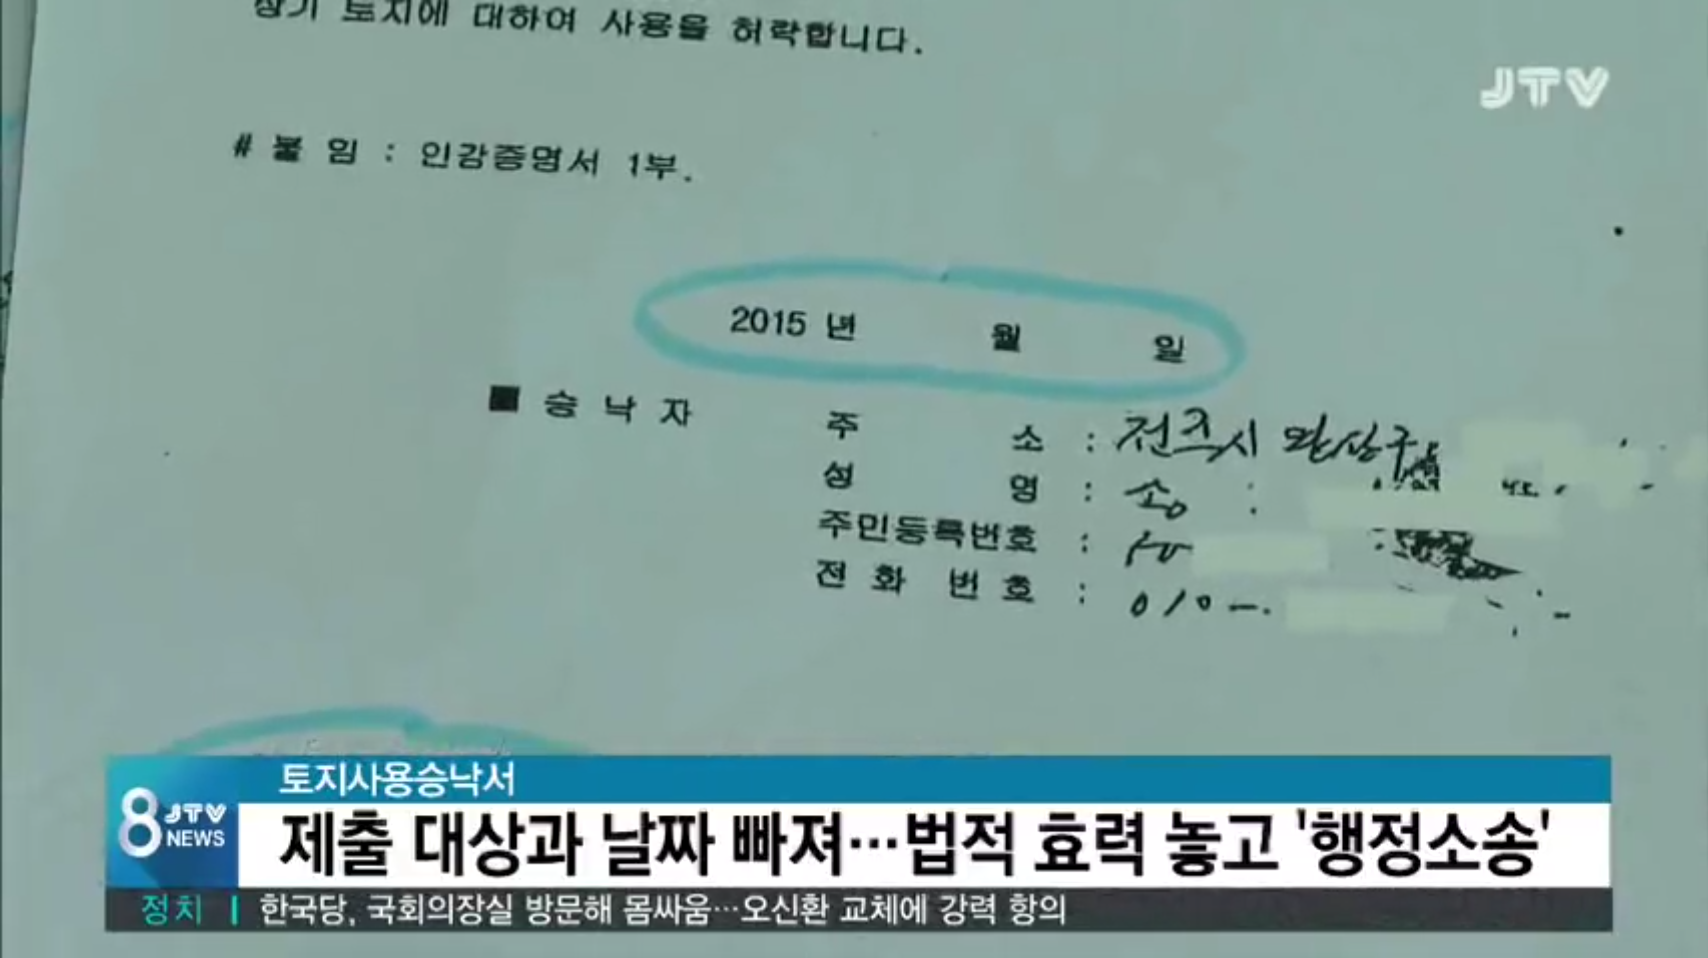 [19.4.24 JTV] 전주시, 아파트재개발 승인 허술, 정보공개 거부로 시민만 골탕5.png